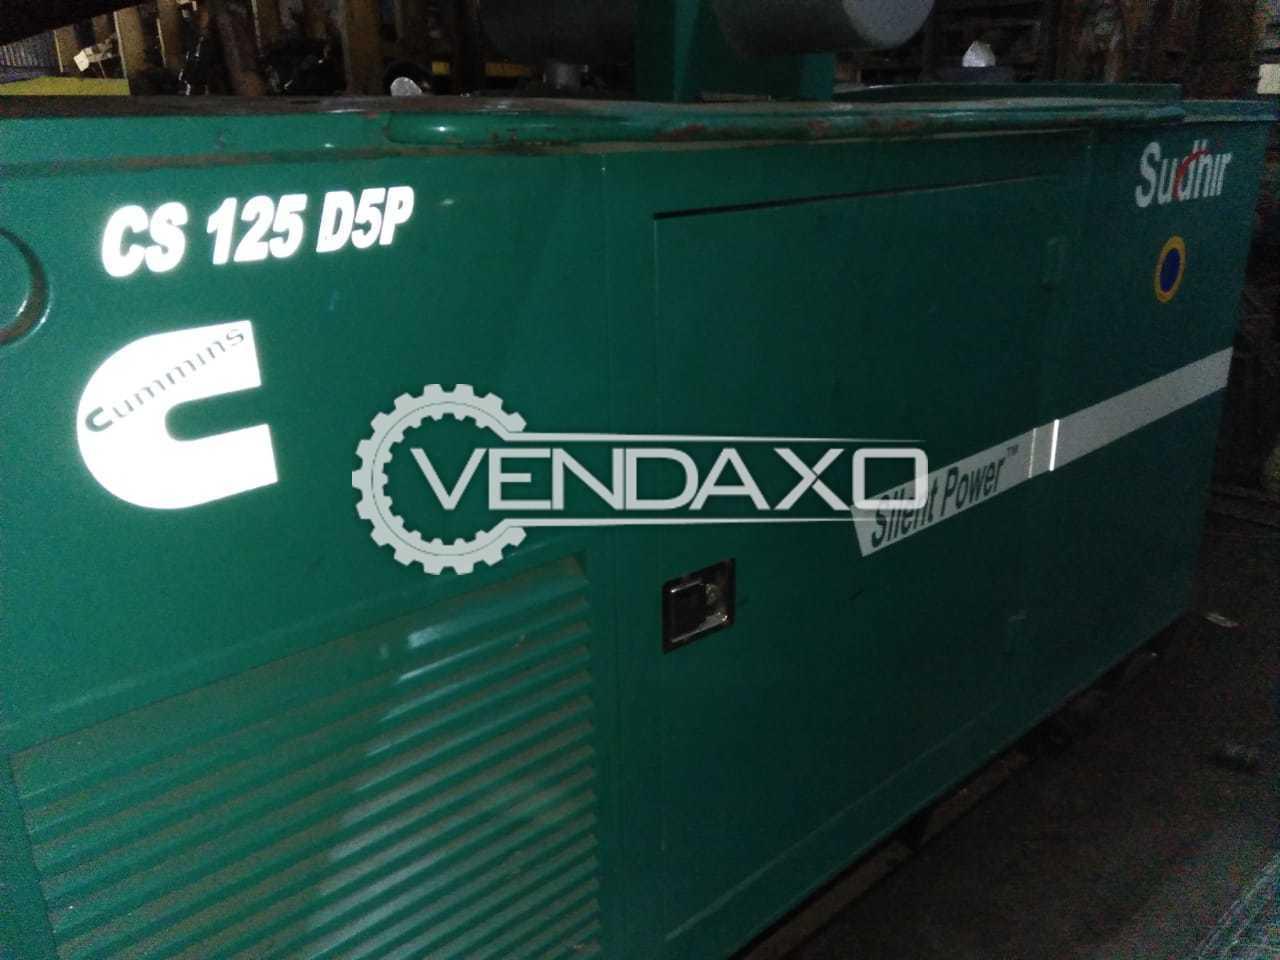 Cummins CS 125 D5P Silent Diesel Generator - 125 kVA